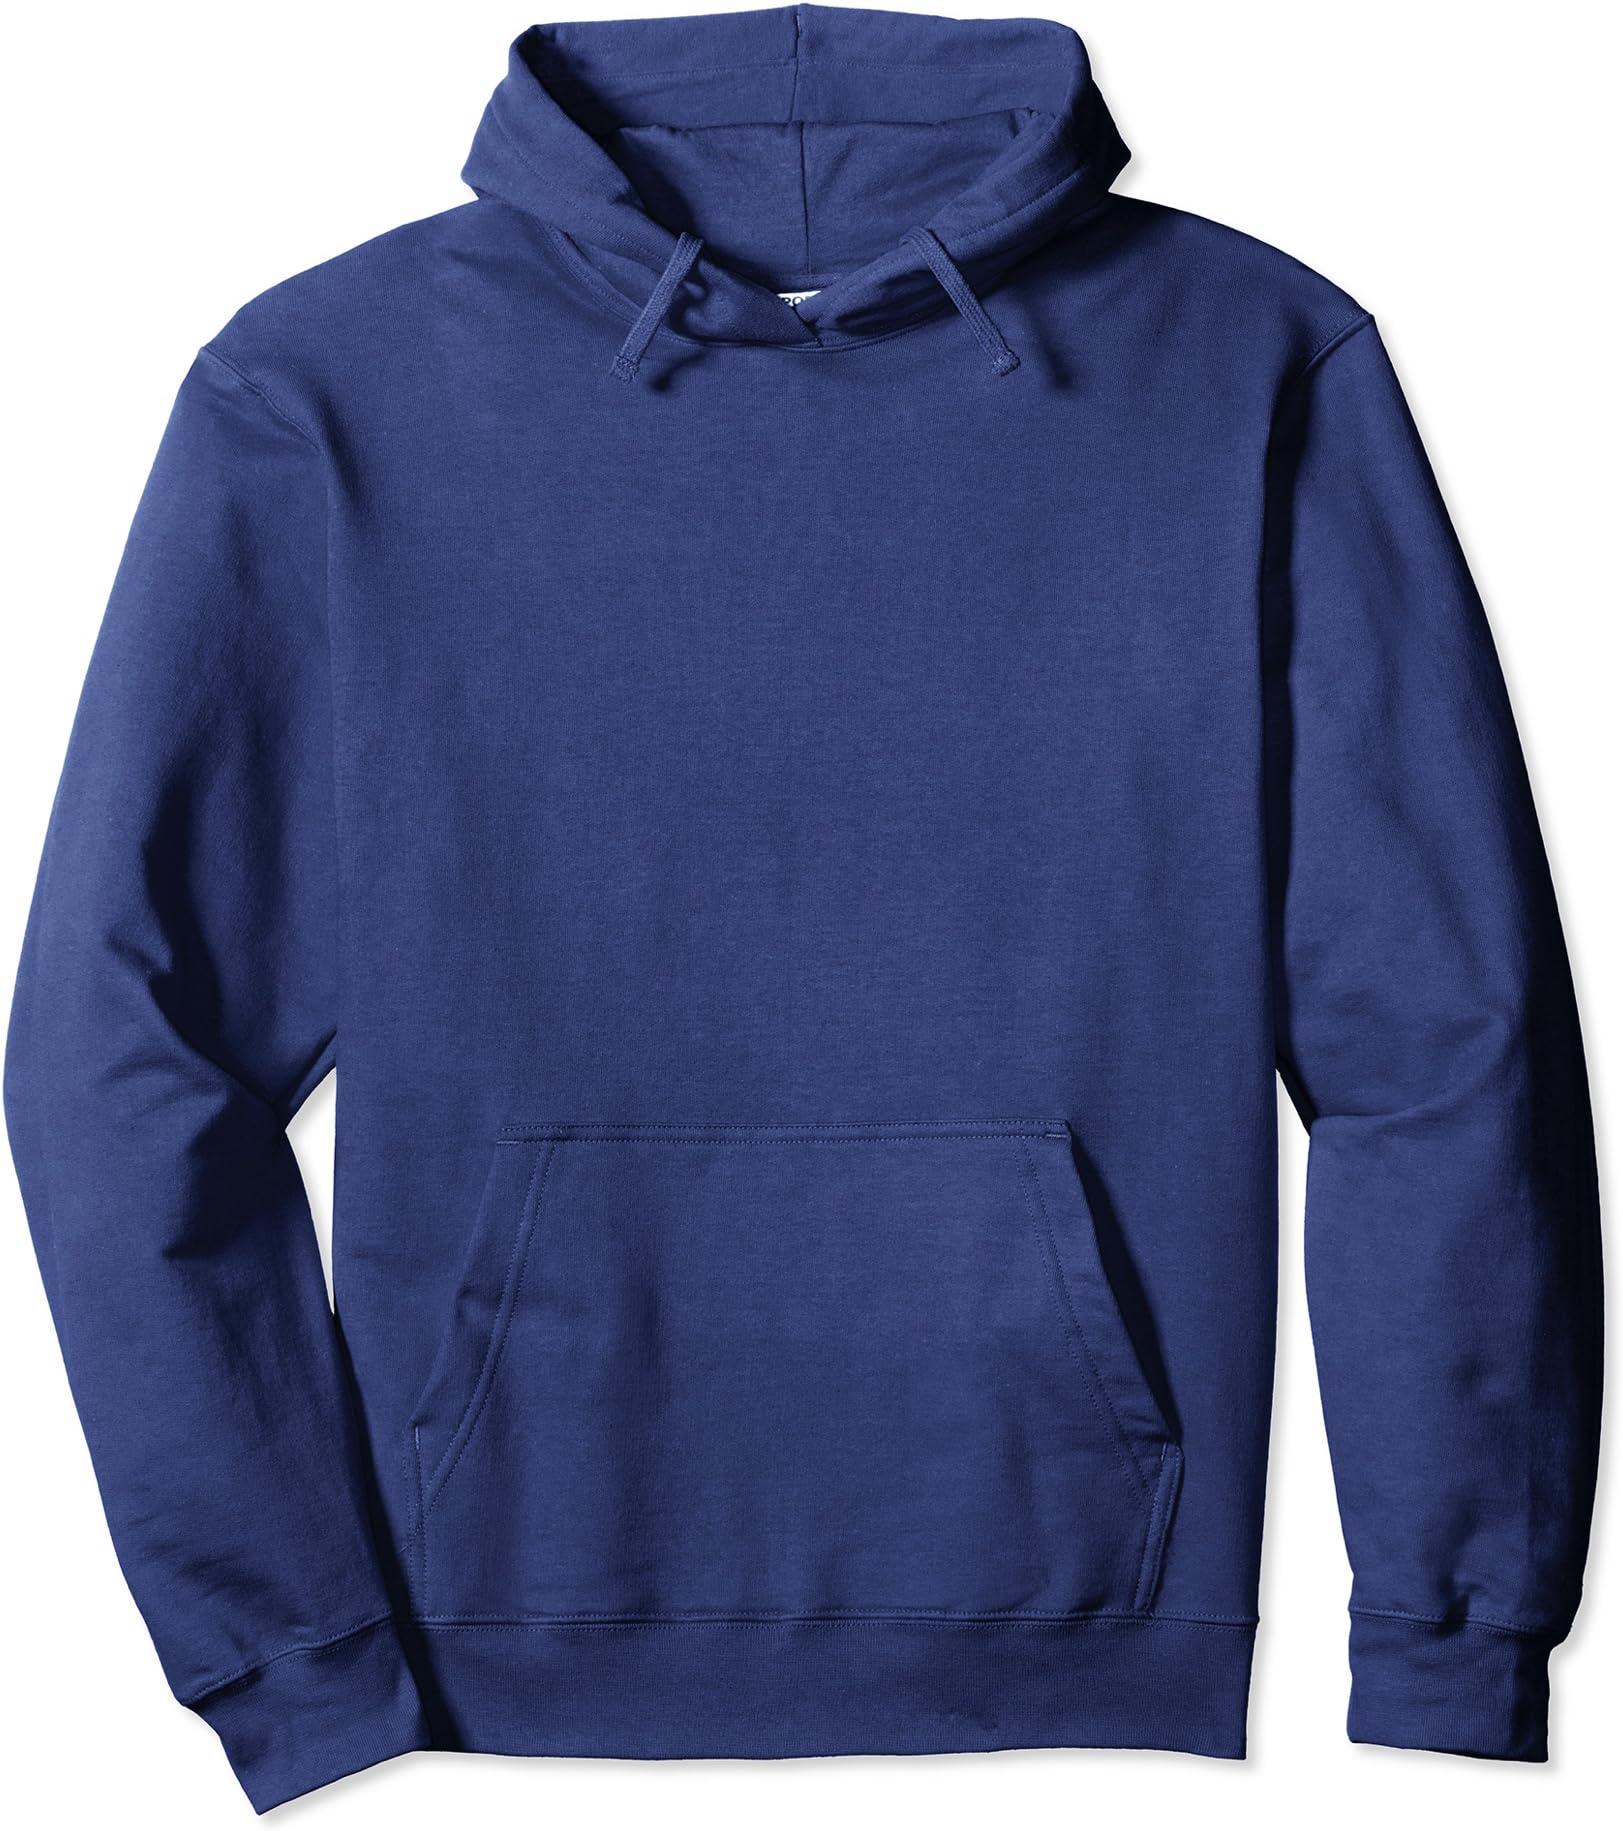 Moonlight Ride Adult Crewneck Sweatshirt Garfield